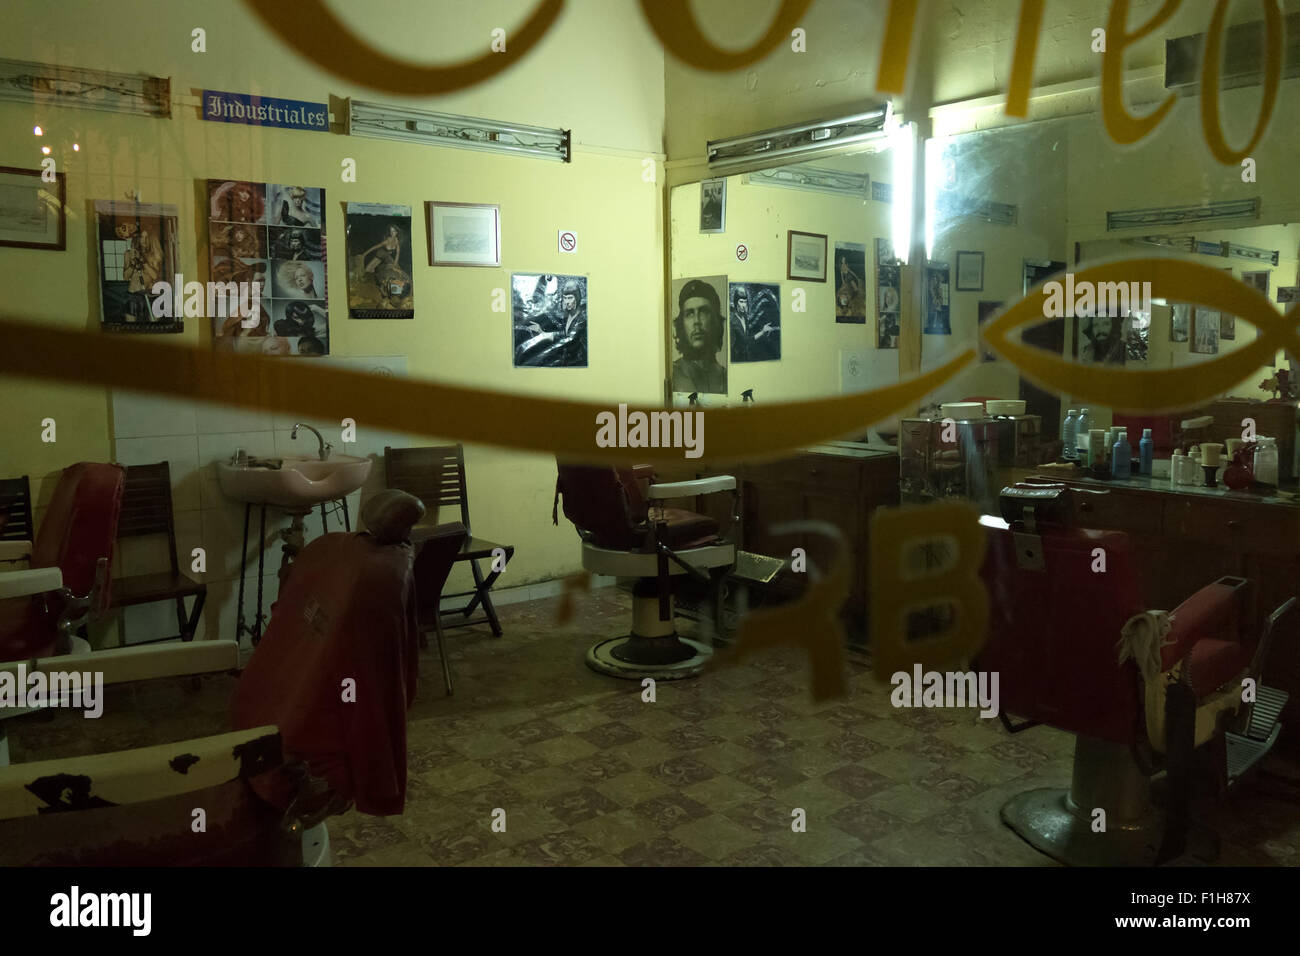 Barber shop, barber's, men's old beauty parlor in Havana, Cuba - Stock Image